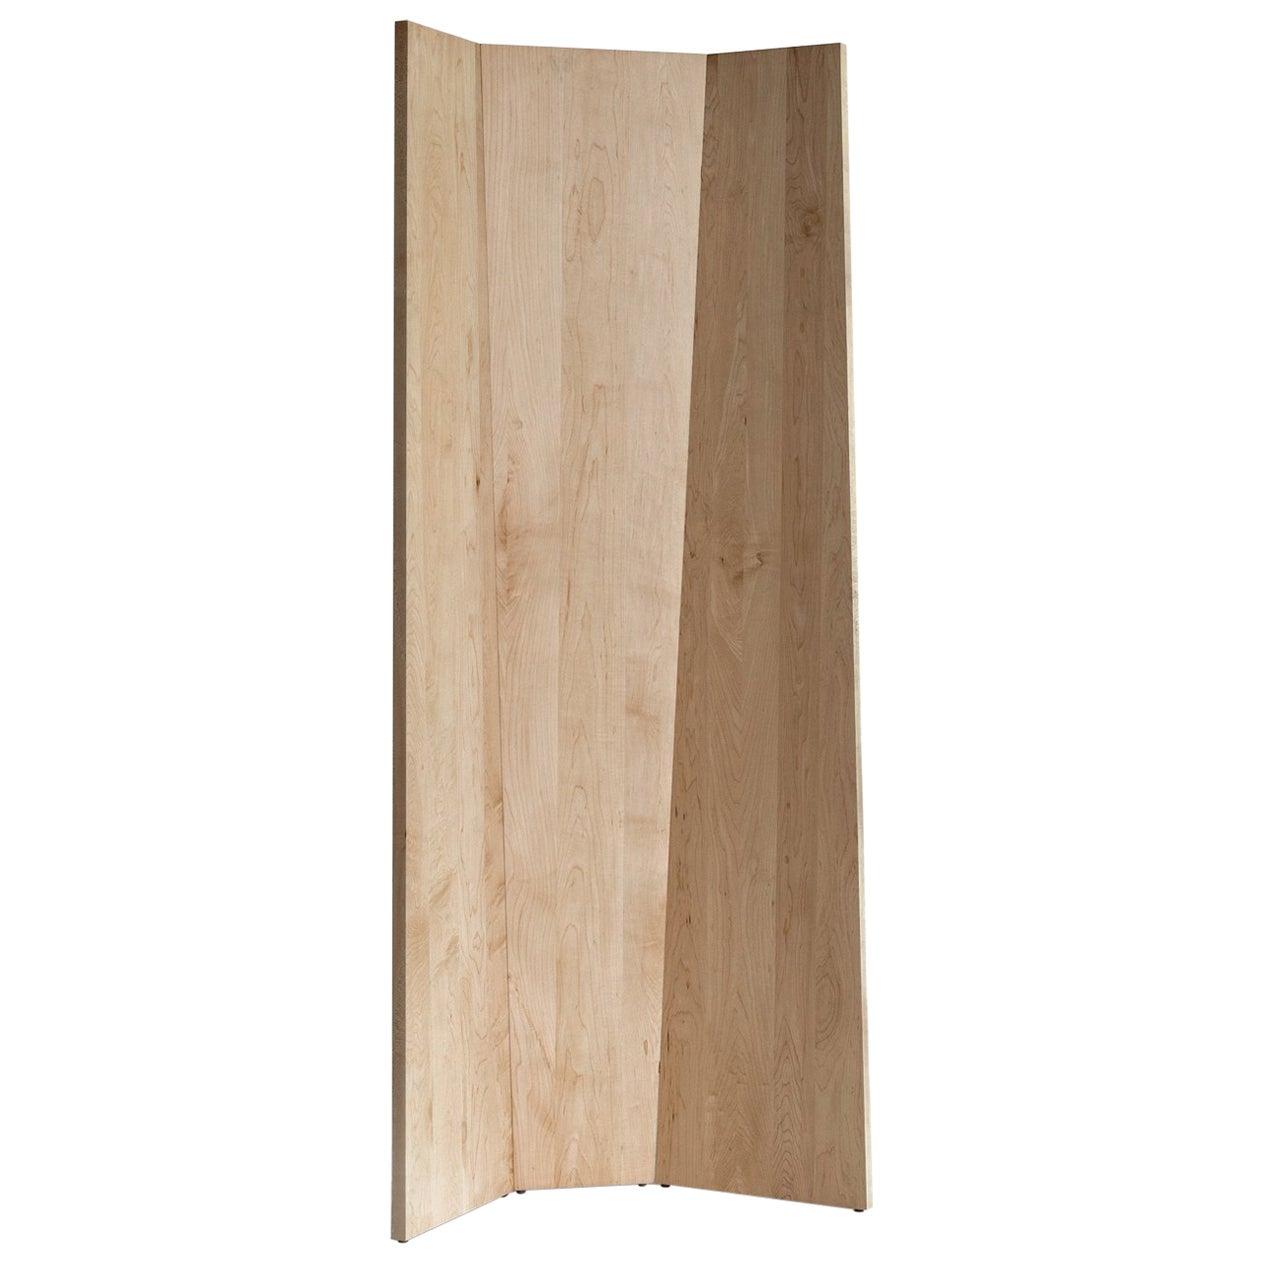 Handmade Tri-Fold Solid Maple Folding Screen or Room Divider